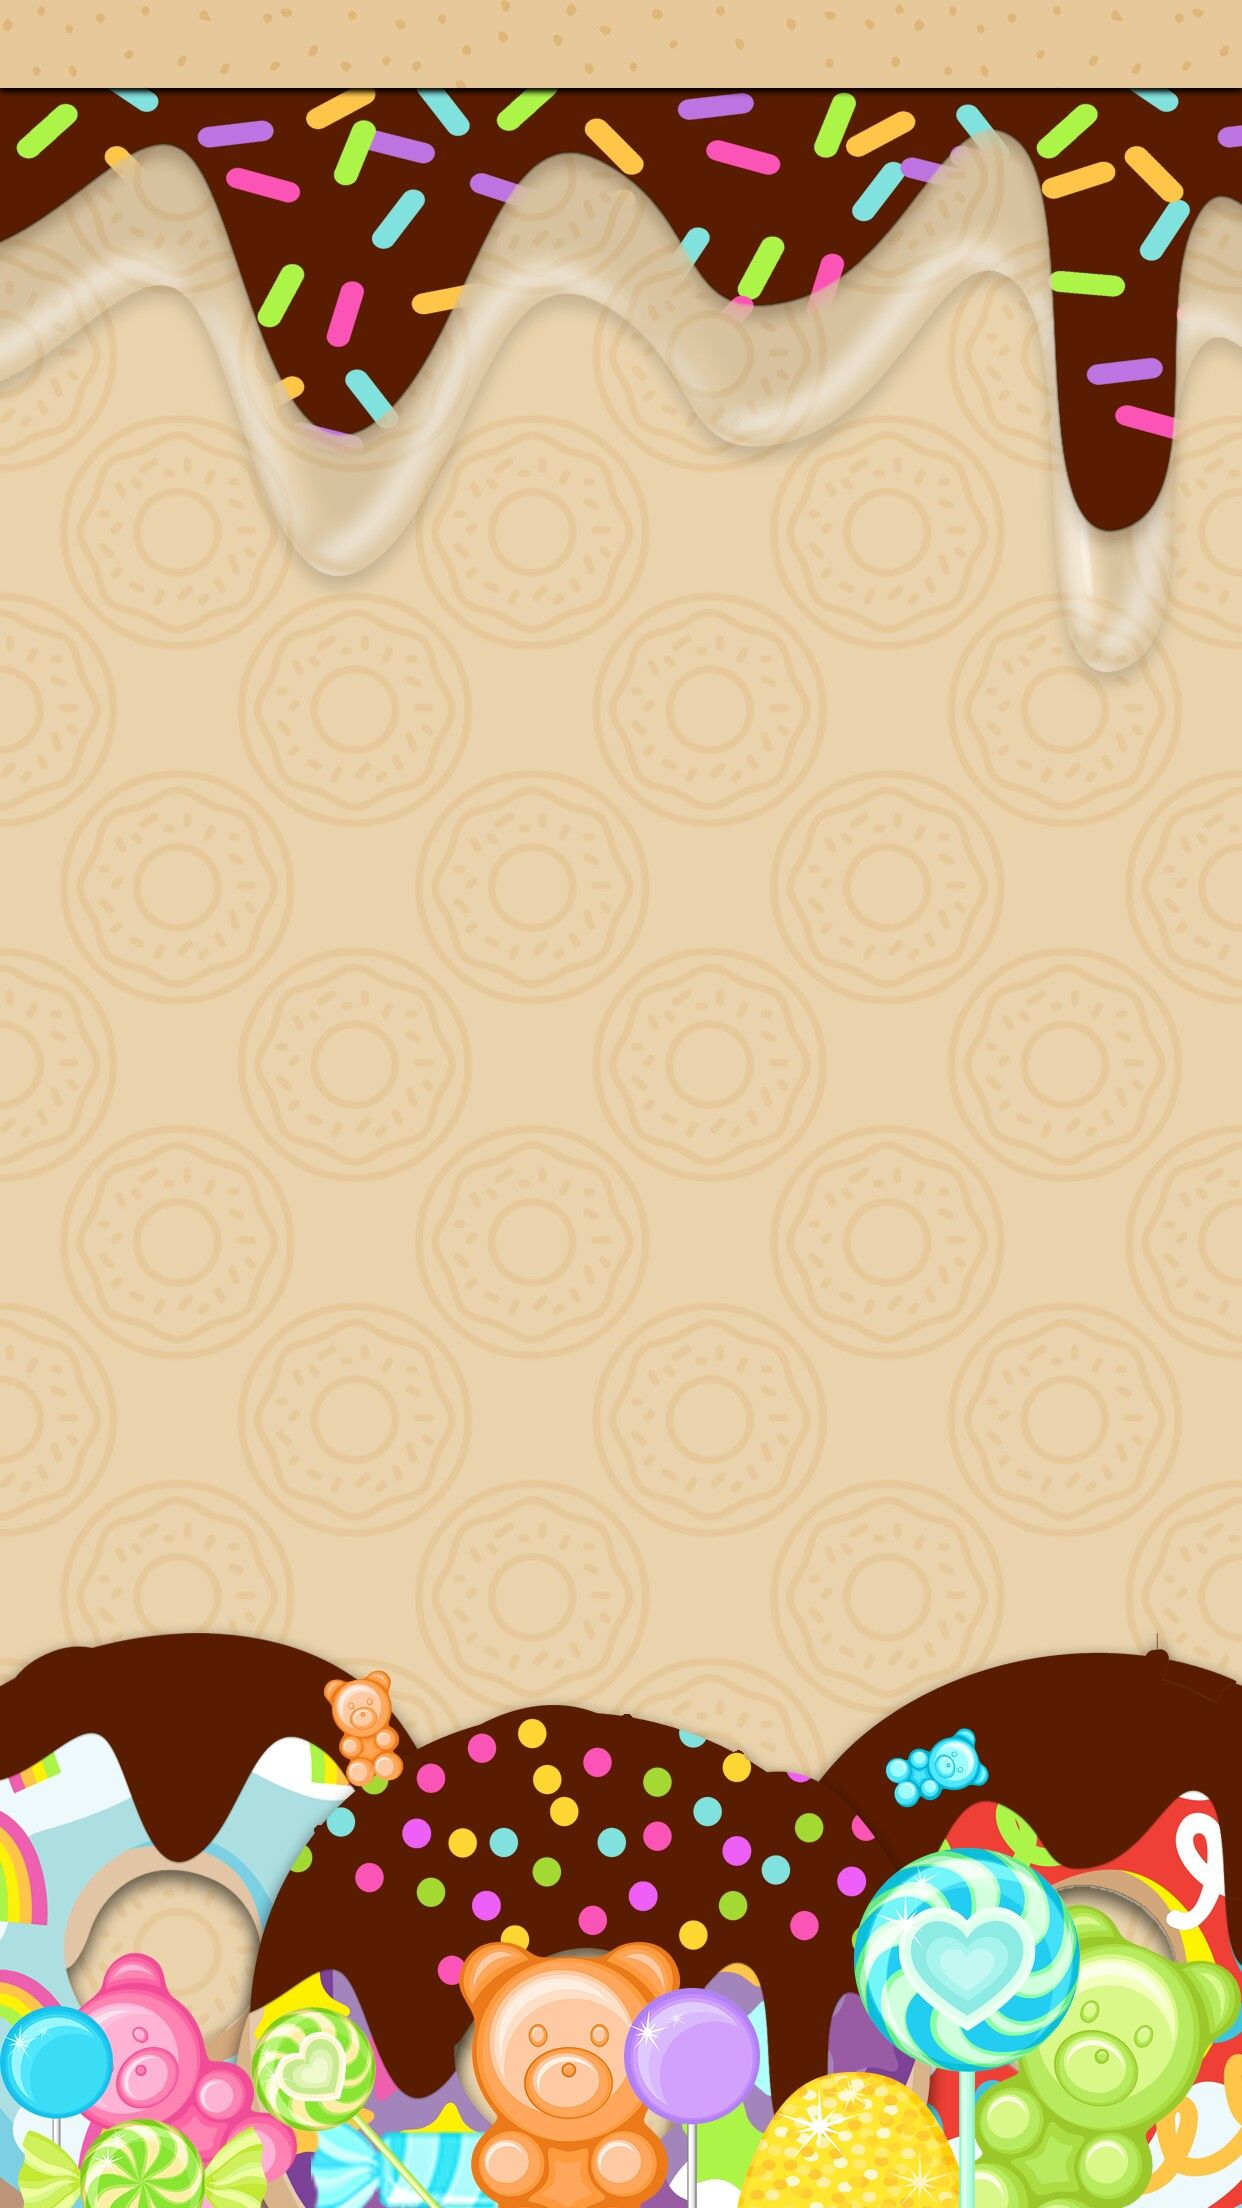 Chocolate Kiss Como Criar Logotipo Gratis Wallpapers Bonitos